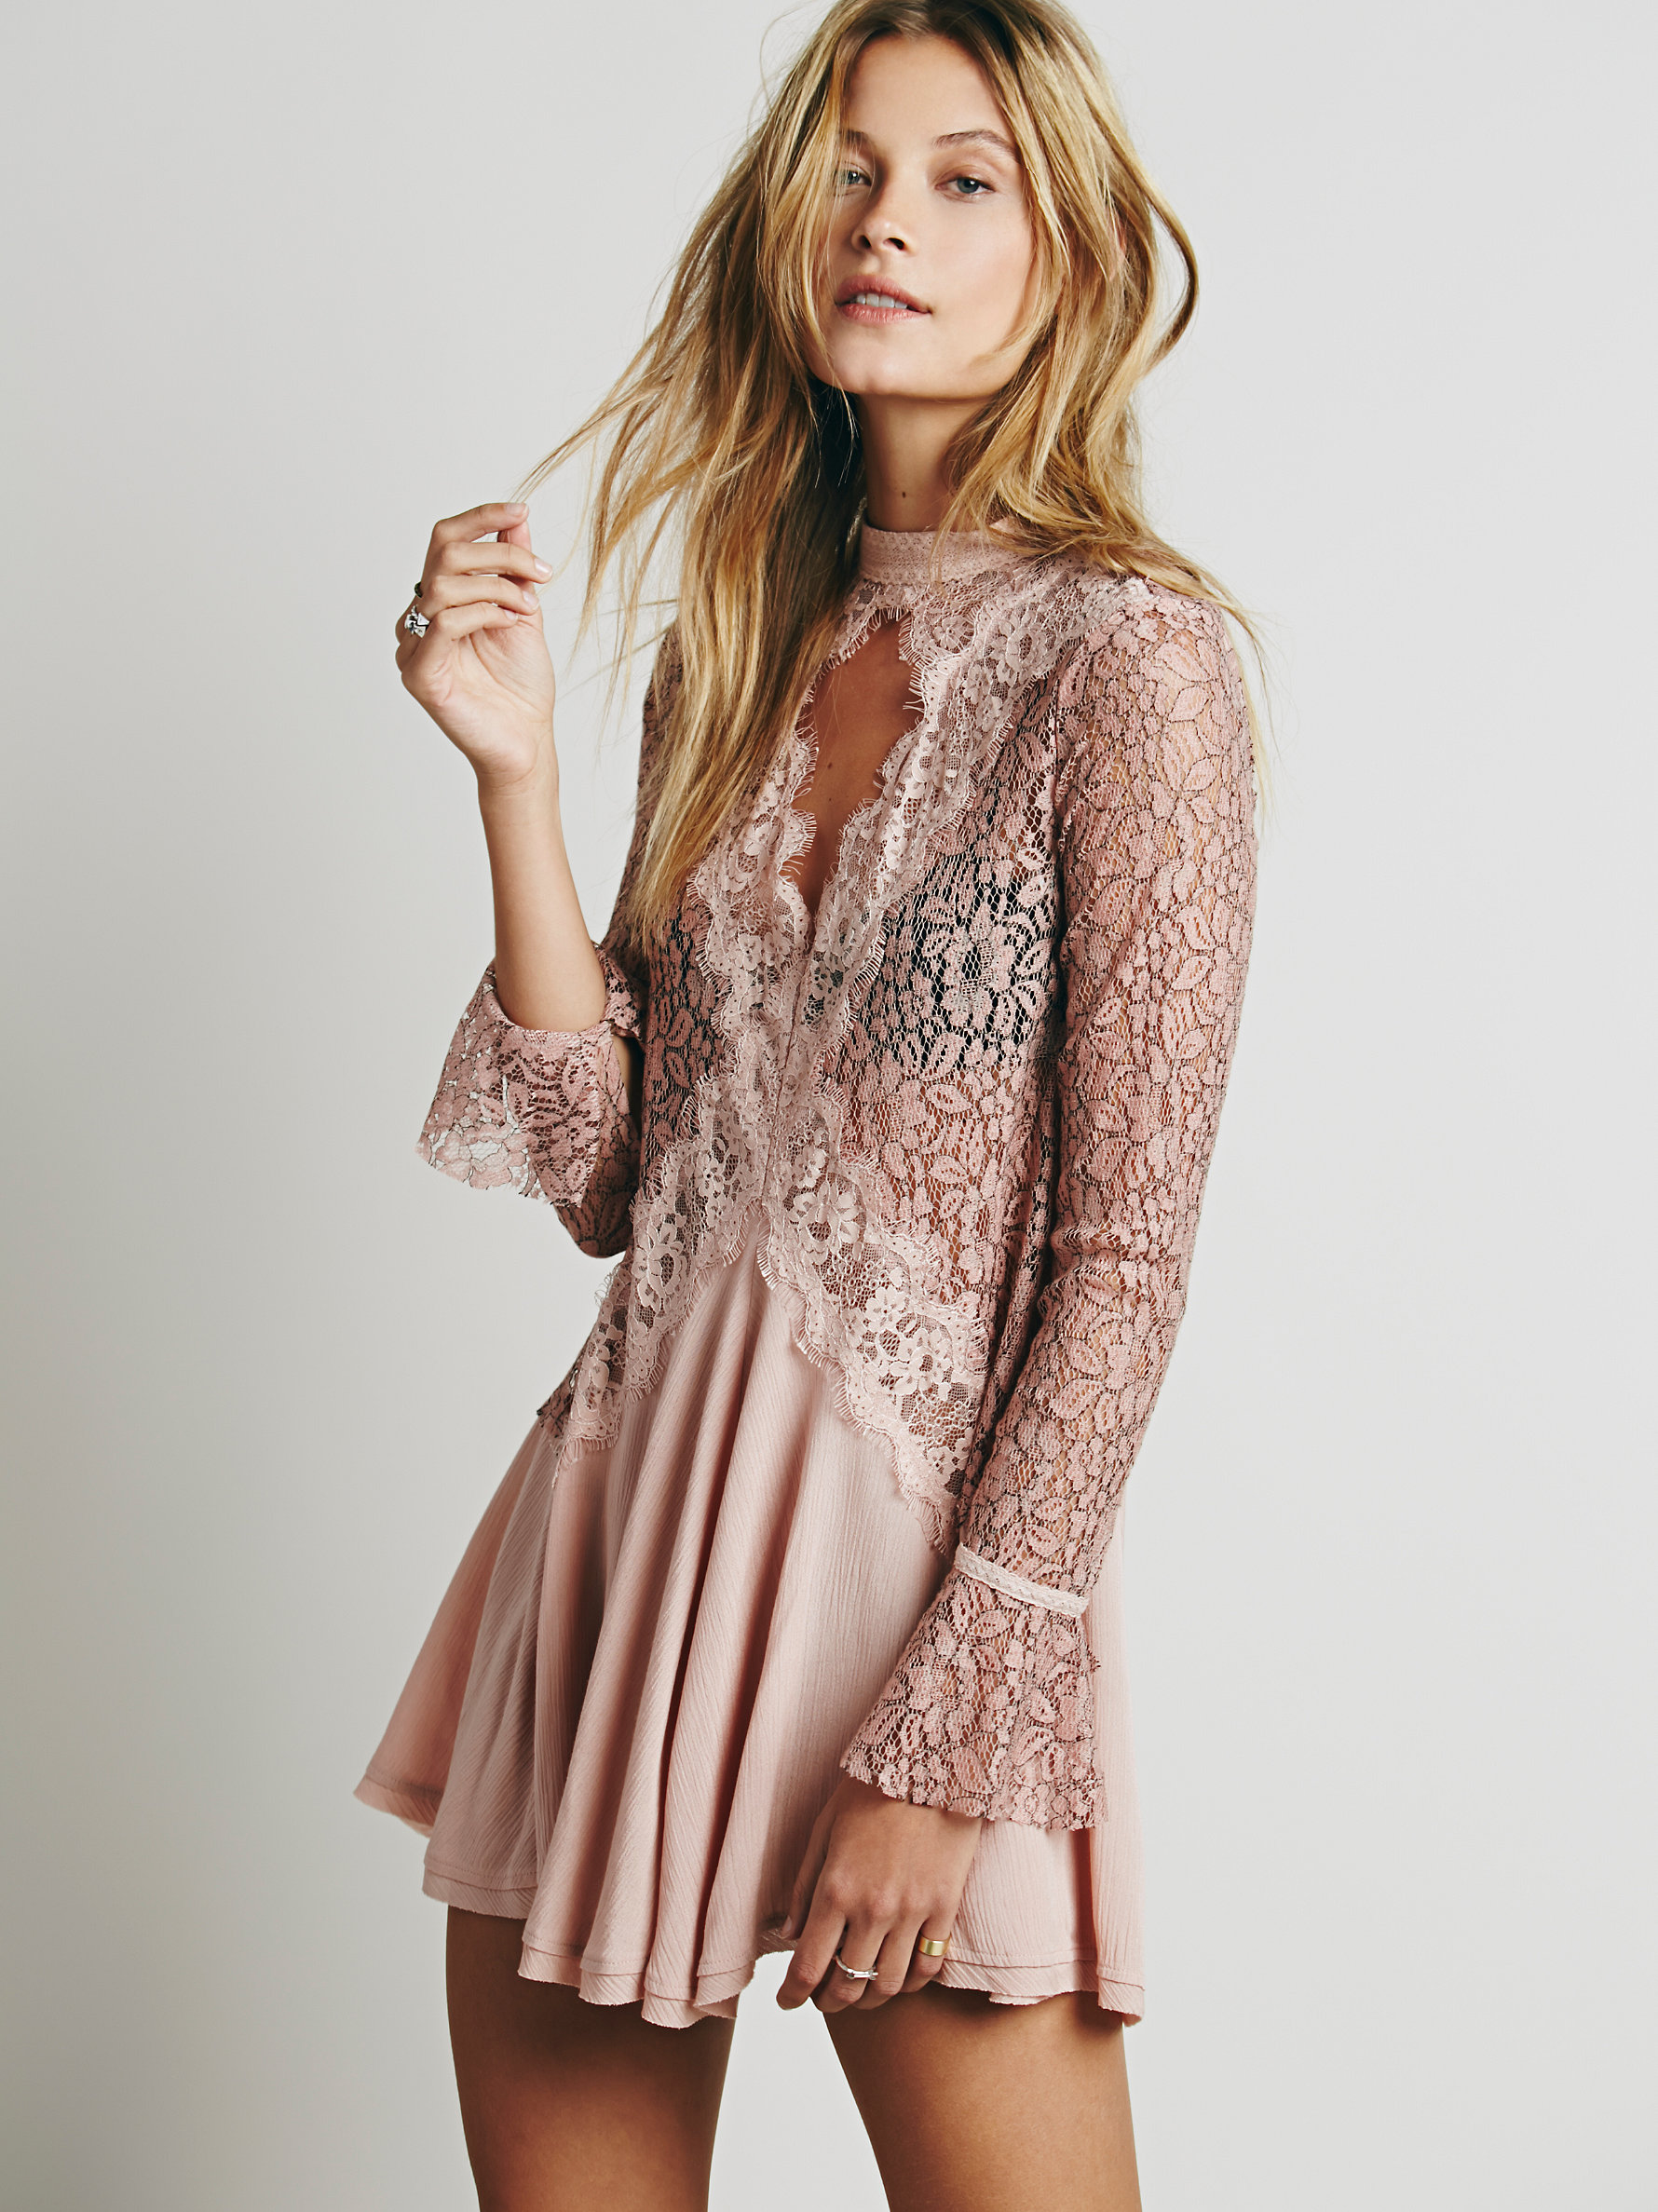 Fancy Friday - Versatile Valentine's Day Dresses